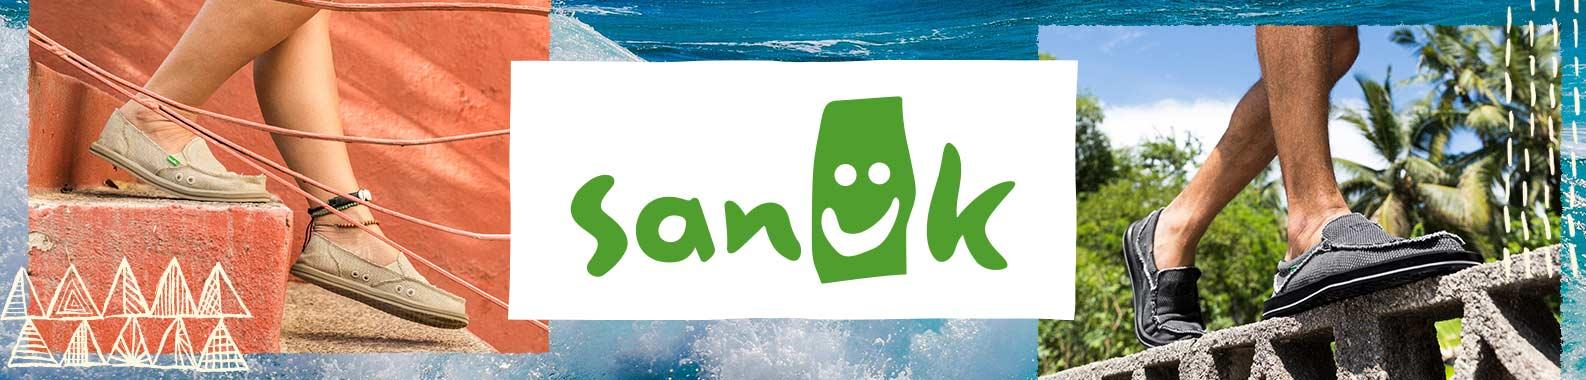 Sanuk header image